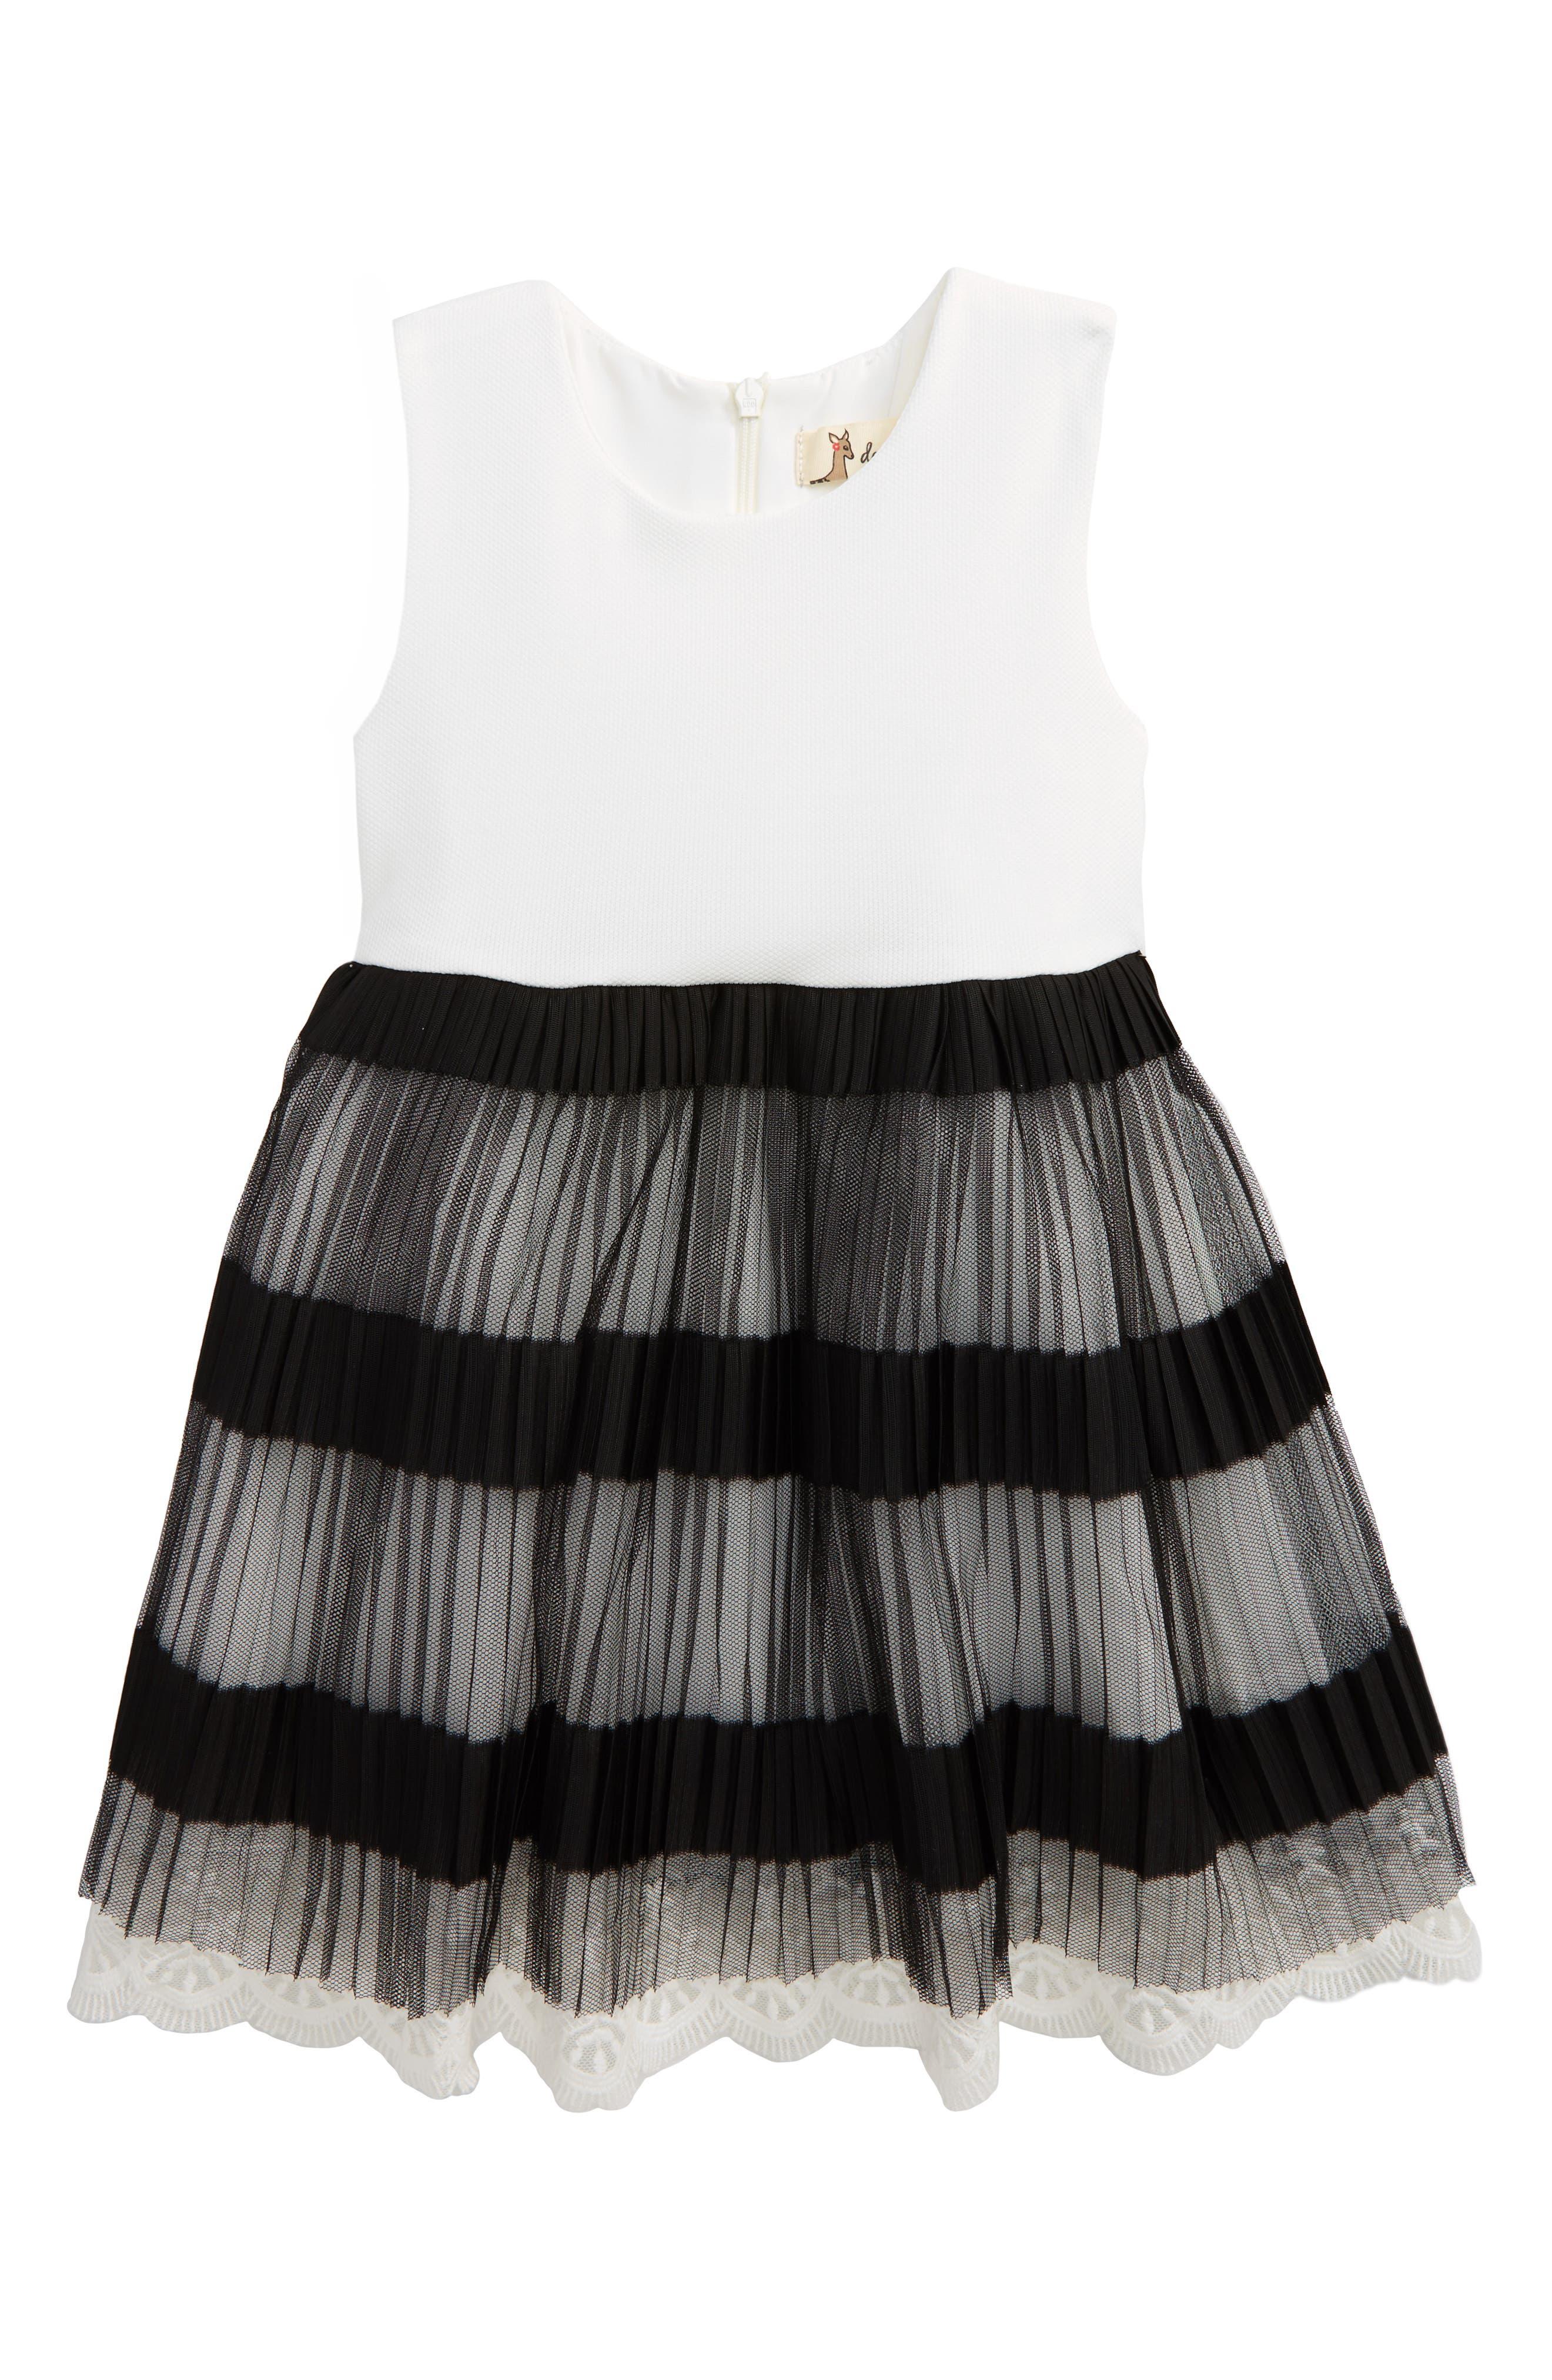 Main Image - Doe A Dear Accordion Pleated Dress (Toddler Girls, Little Girls & Big Girls)